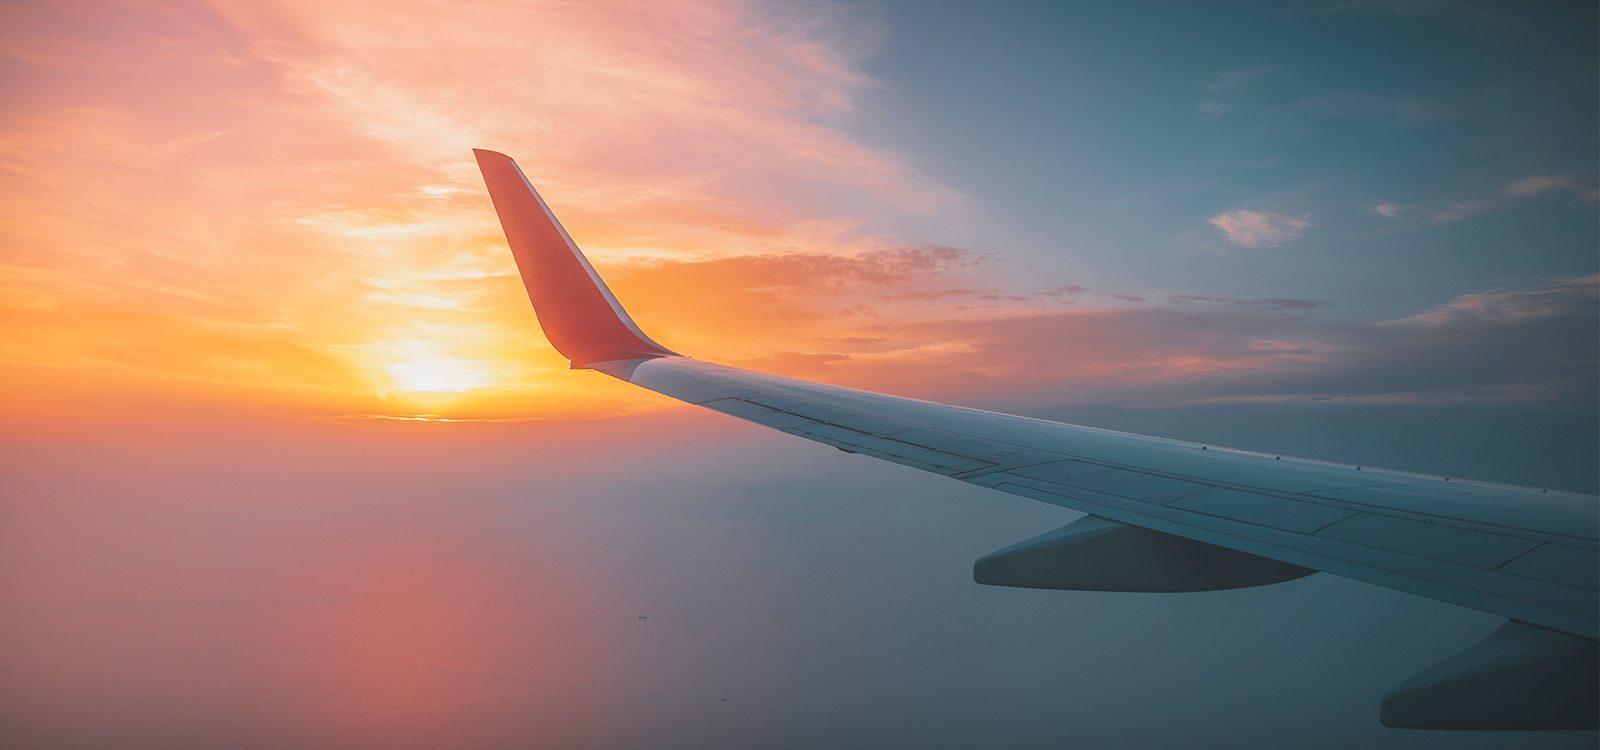 Travel Insurance – Fight or Flight